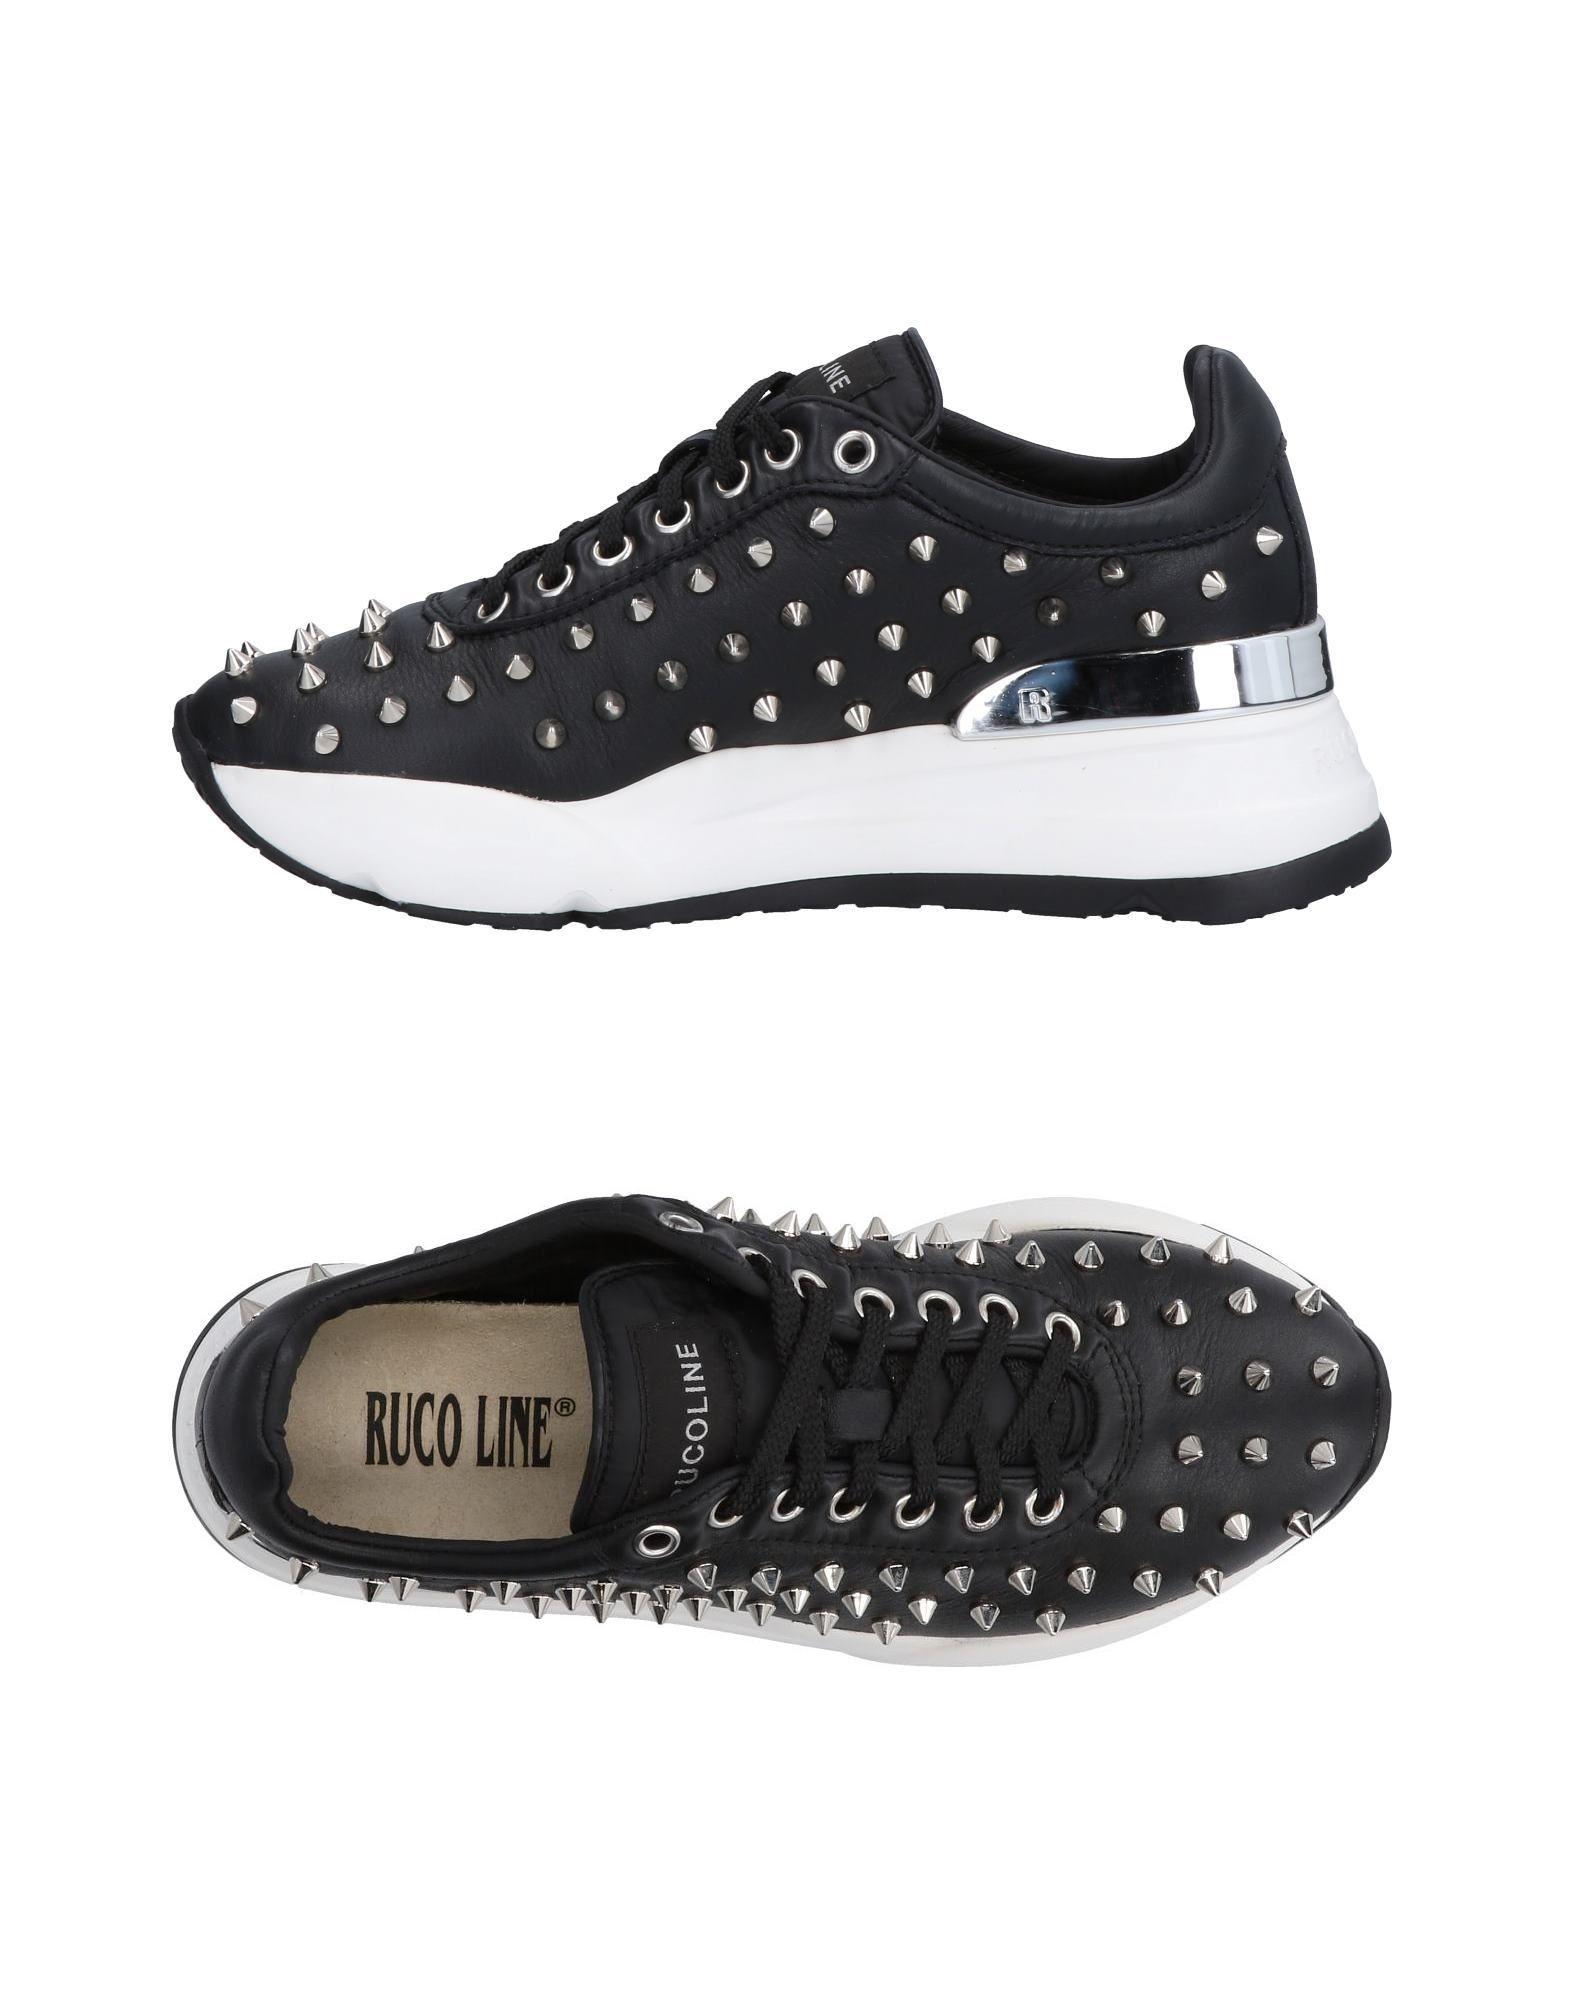 Ruco Line Sneakers Damen  11496044EWGut aussehende strapazierfähige Schuhe